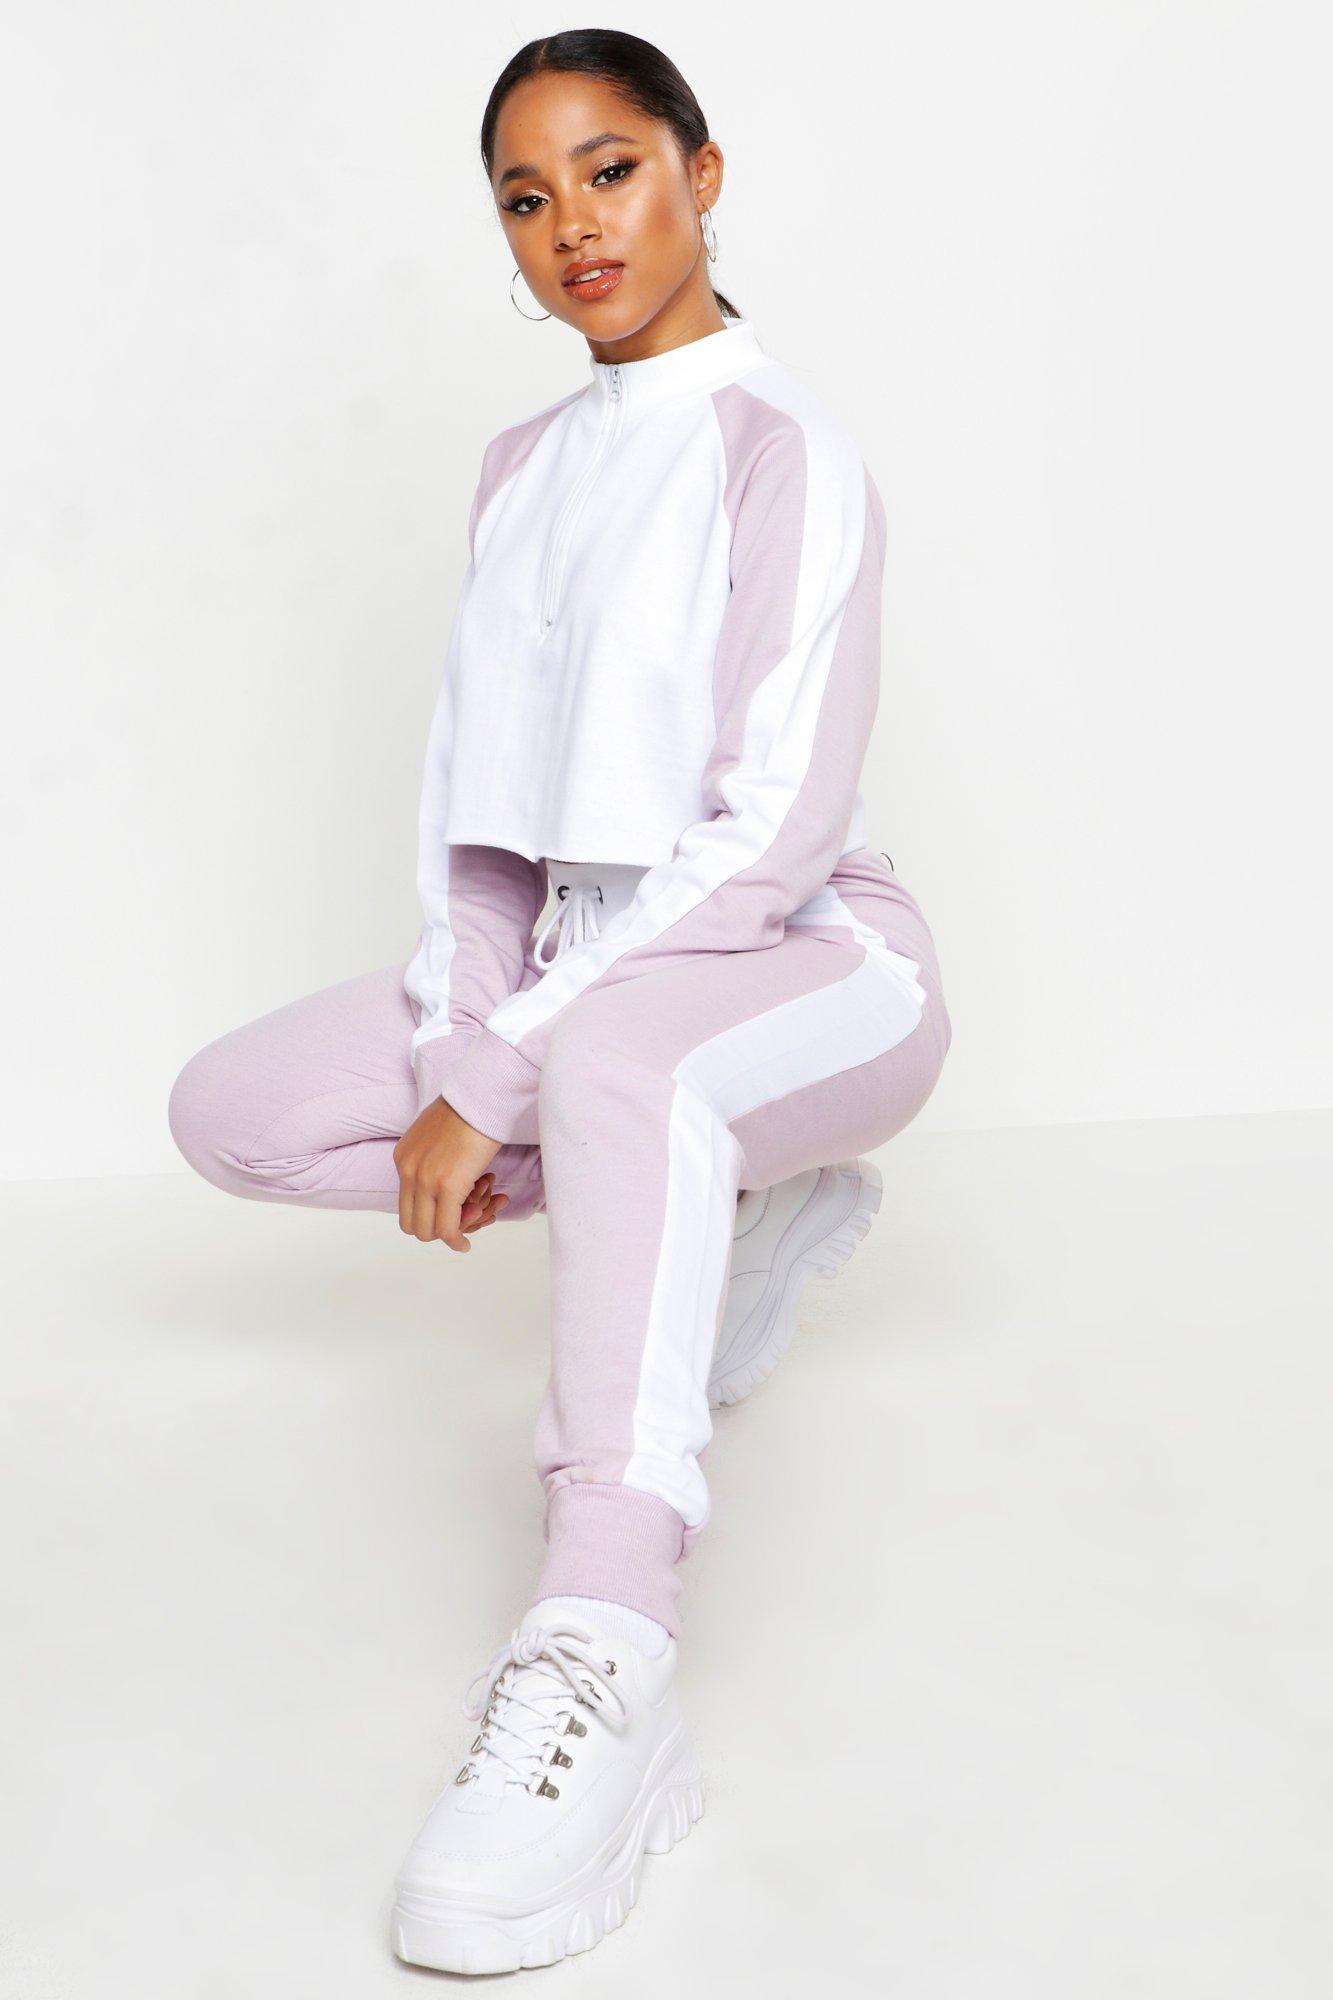 Womens Colorblock-Trainingsanzug mit Reißverschluss-Detail - Flieder - 34, Flieder - Boohoo.com